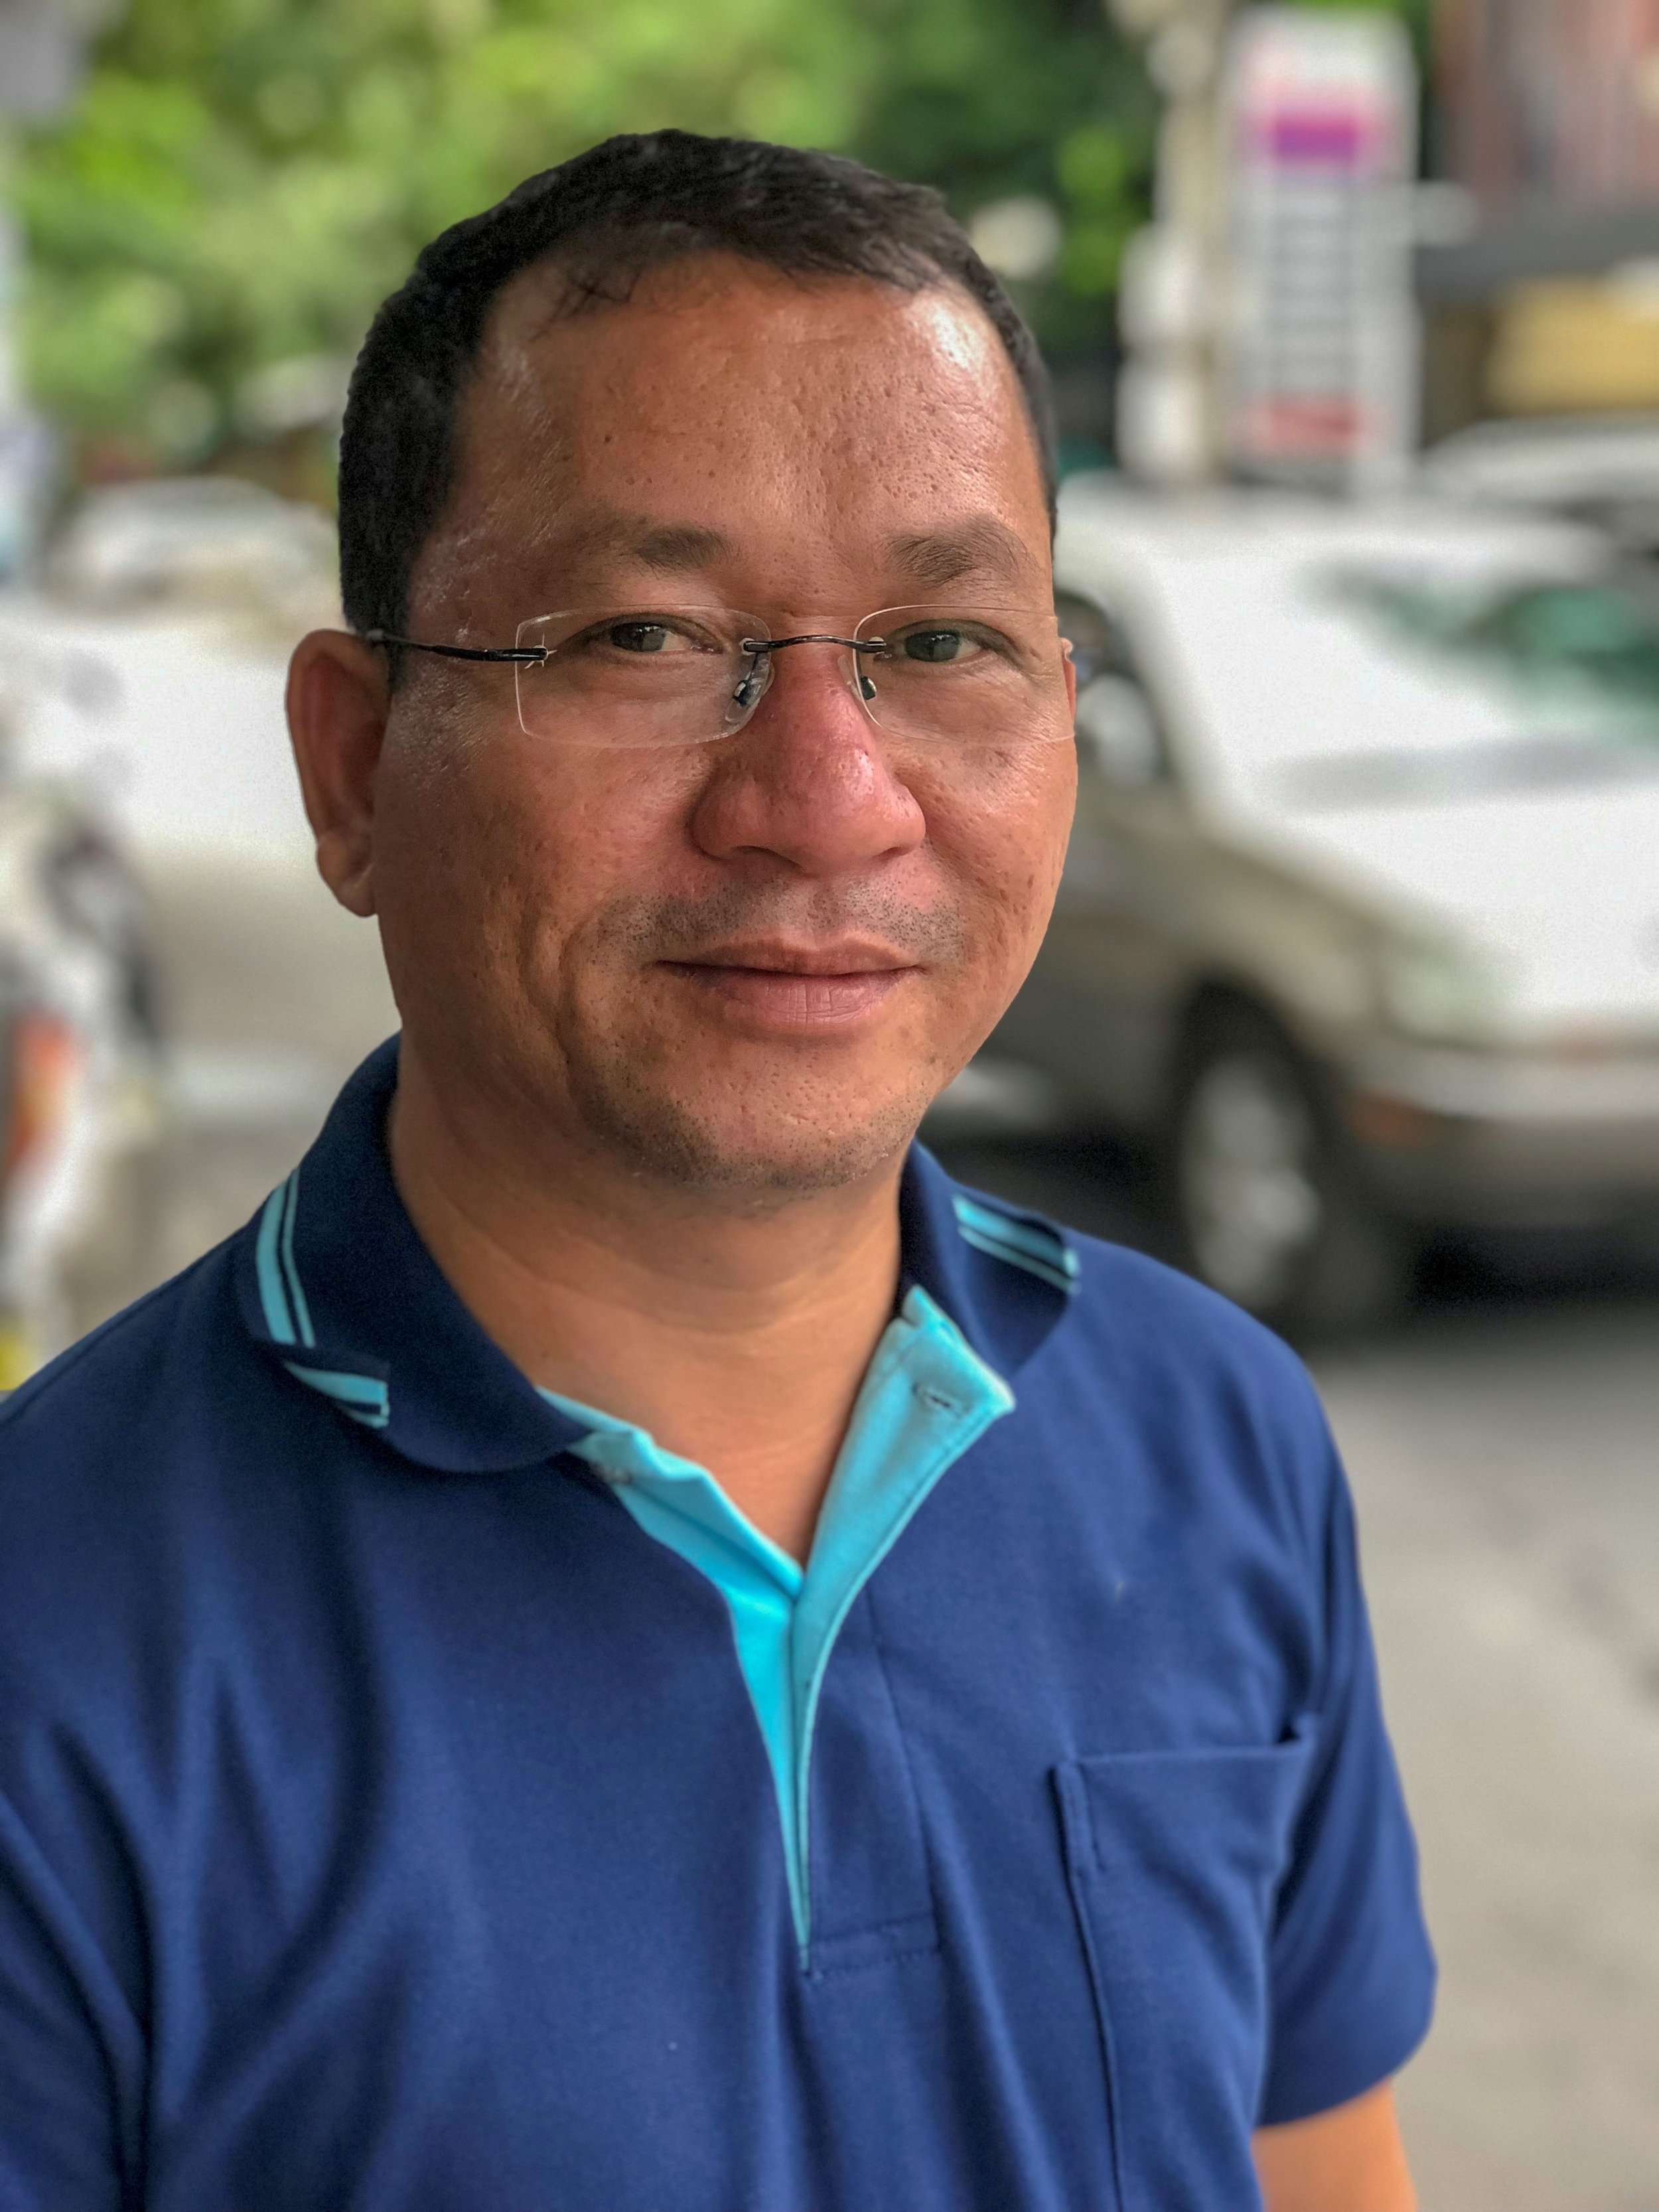 Mr. Nheak Samneang Reachsey,  Chairman of The Lake Clinic-Cambodia